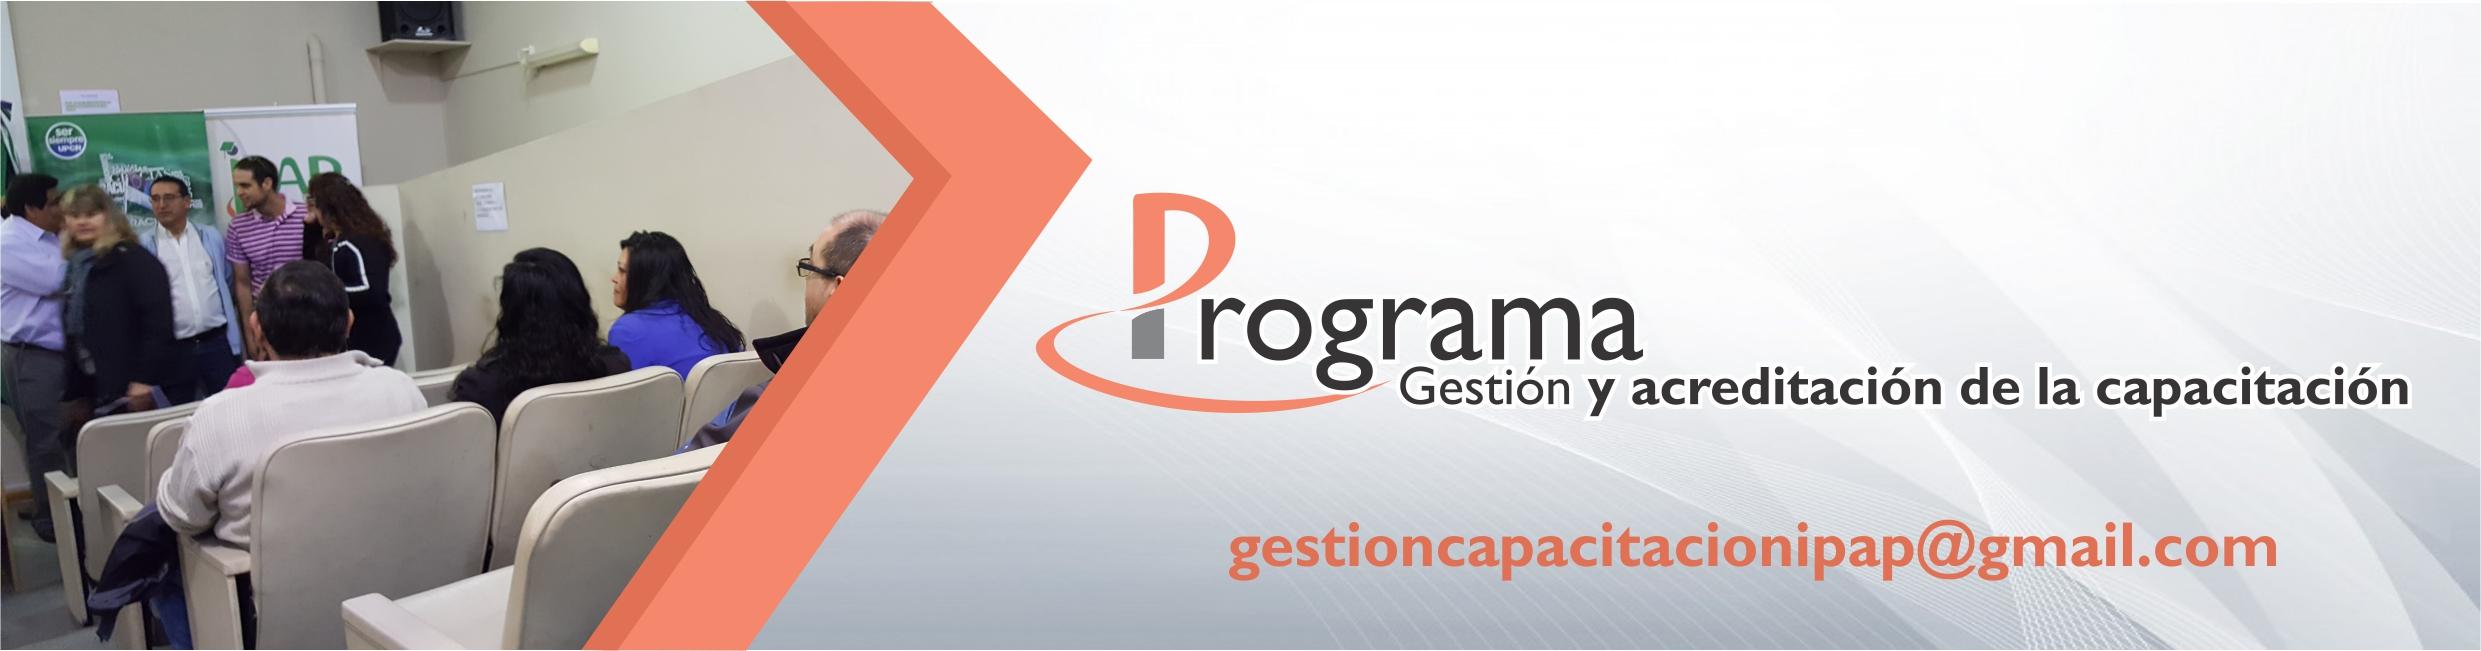 Gest_capacitacion.jpg